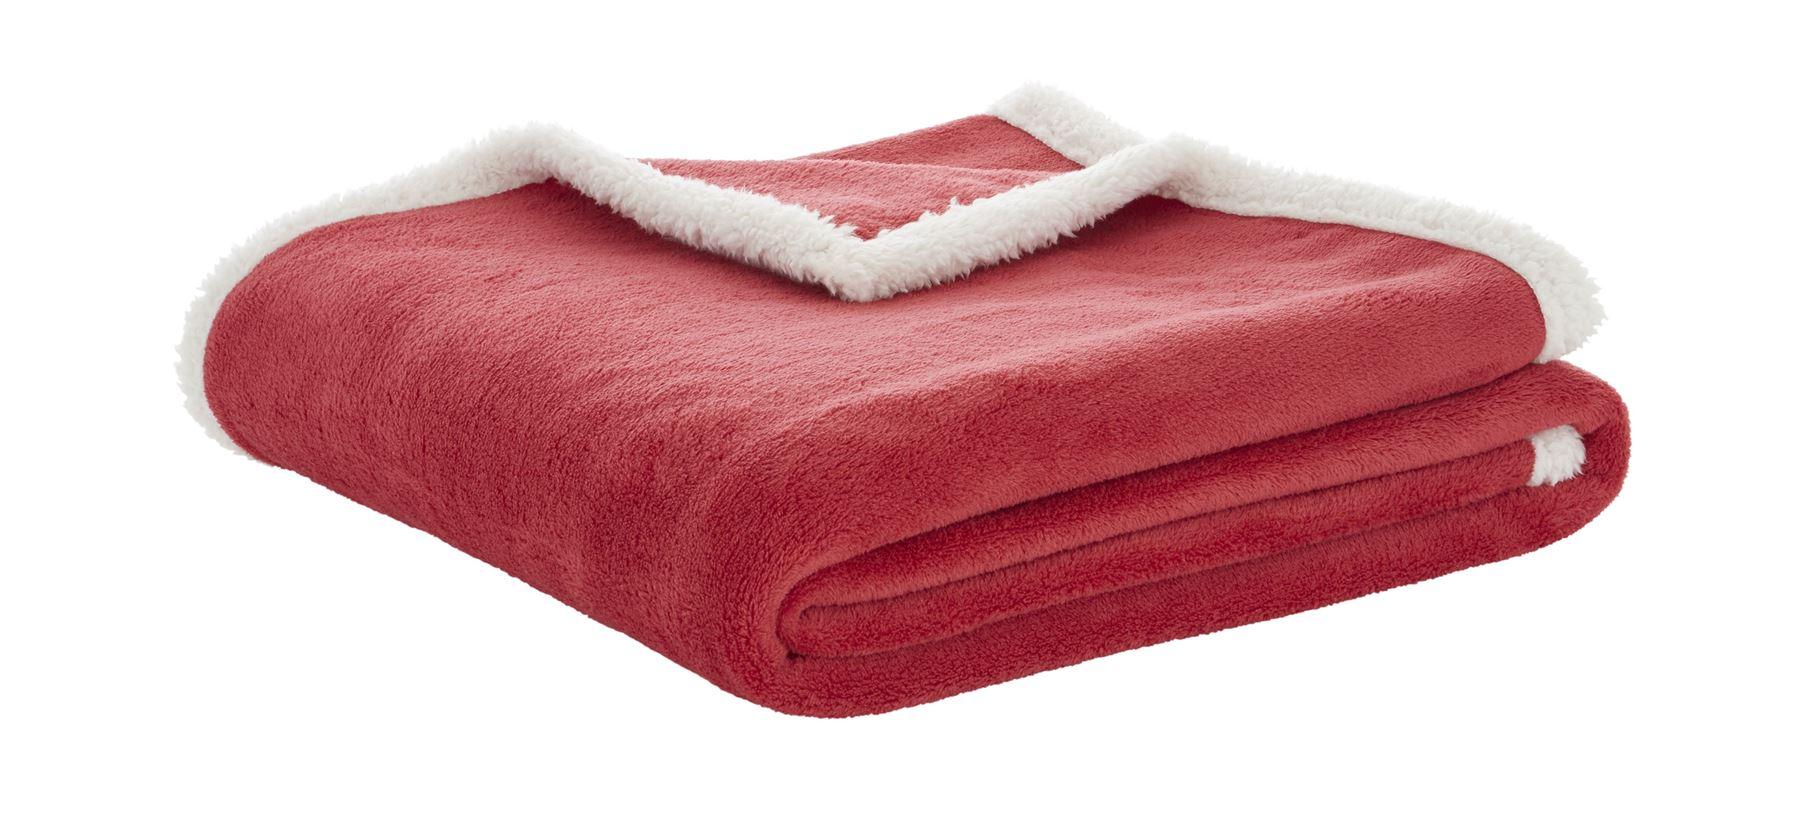 Sherpa Throw Throwover Blanket Soft Bed Sofa Fleece Tartan